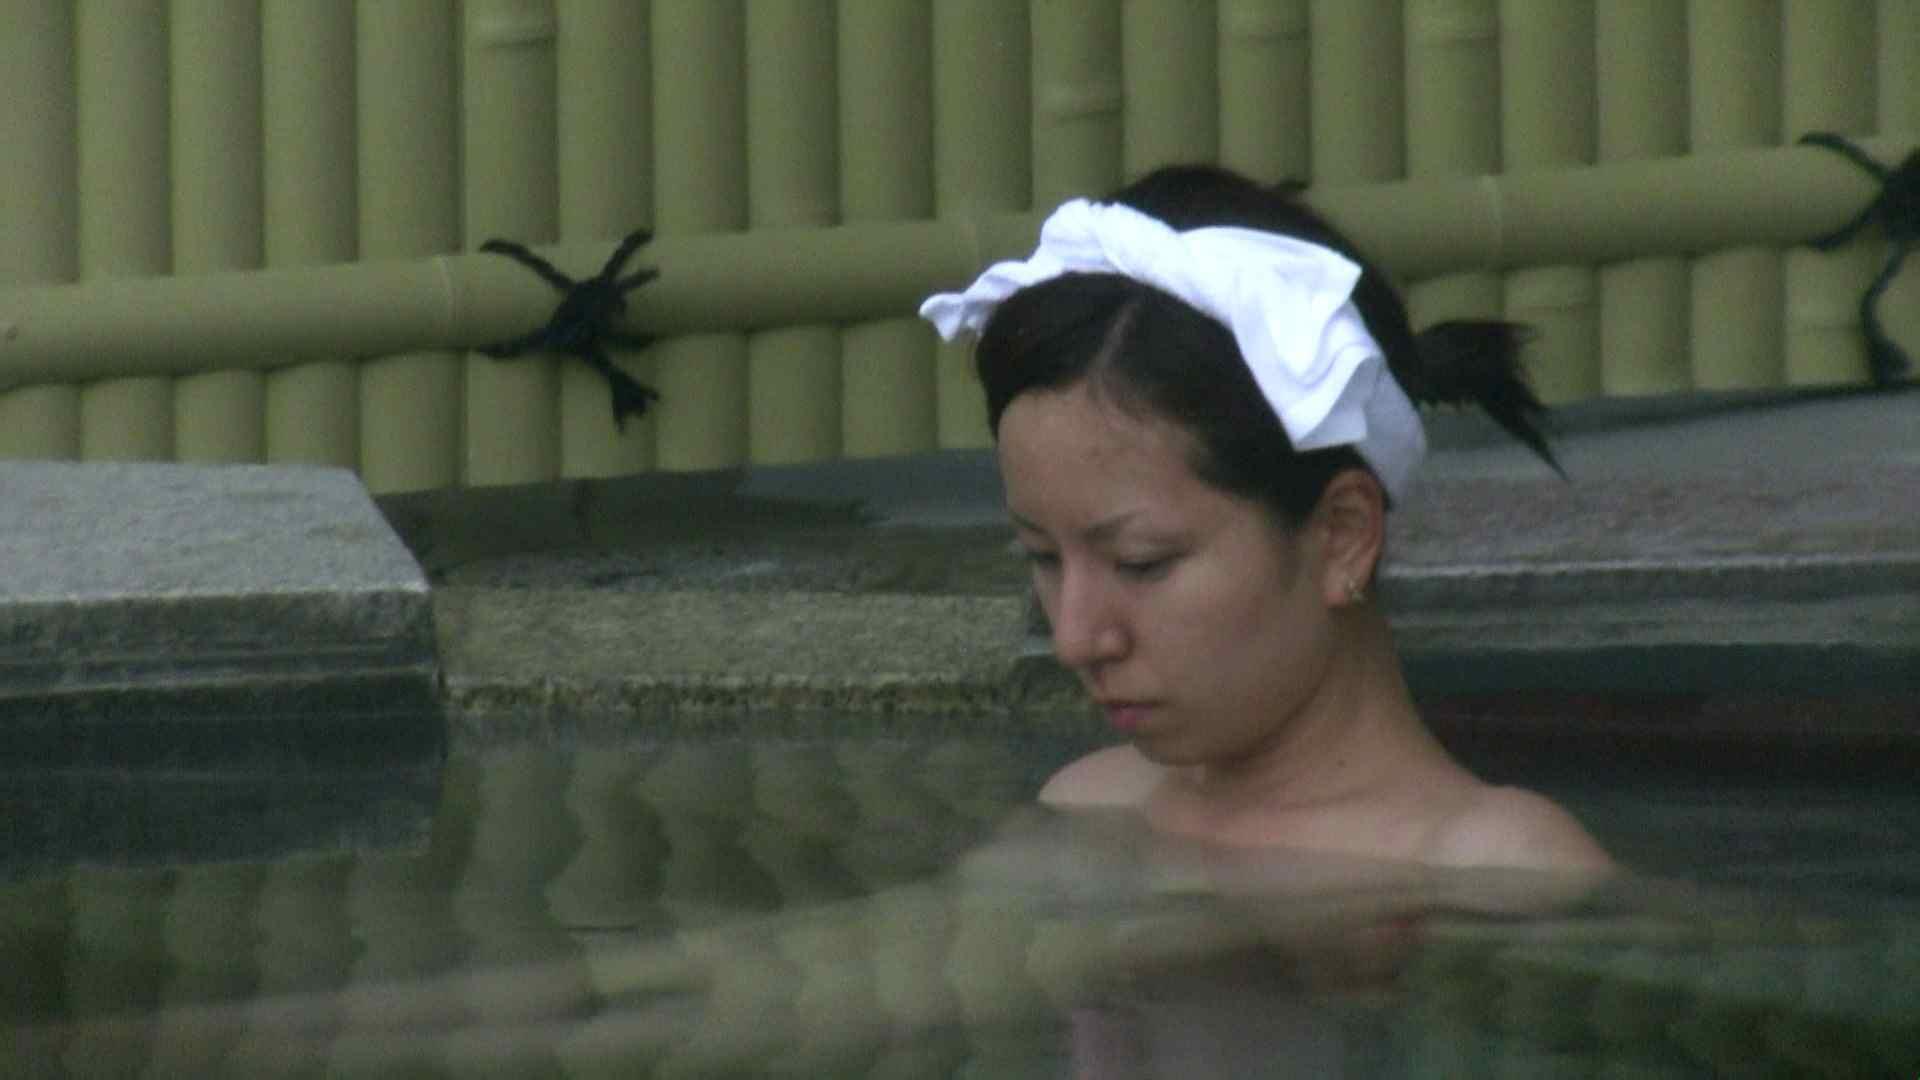 Aquaな露天風呂Vol.39【VIP】 盗撮シリーズ   露天風呂編  85PIX 83